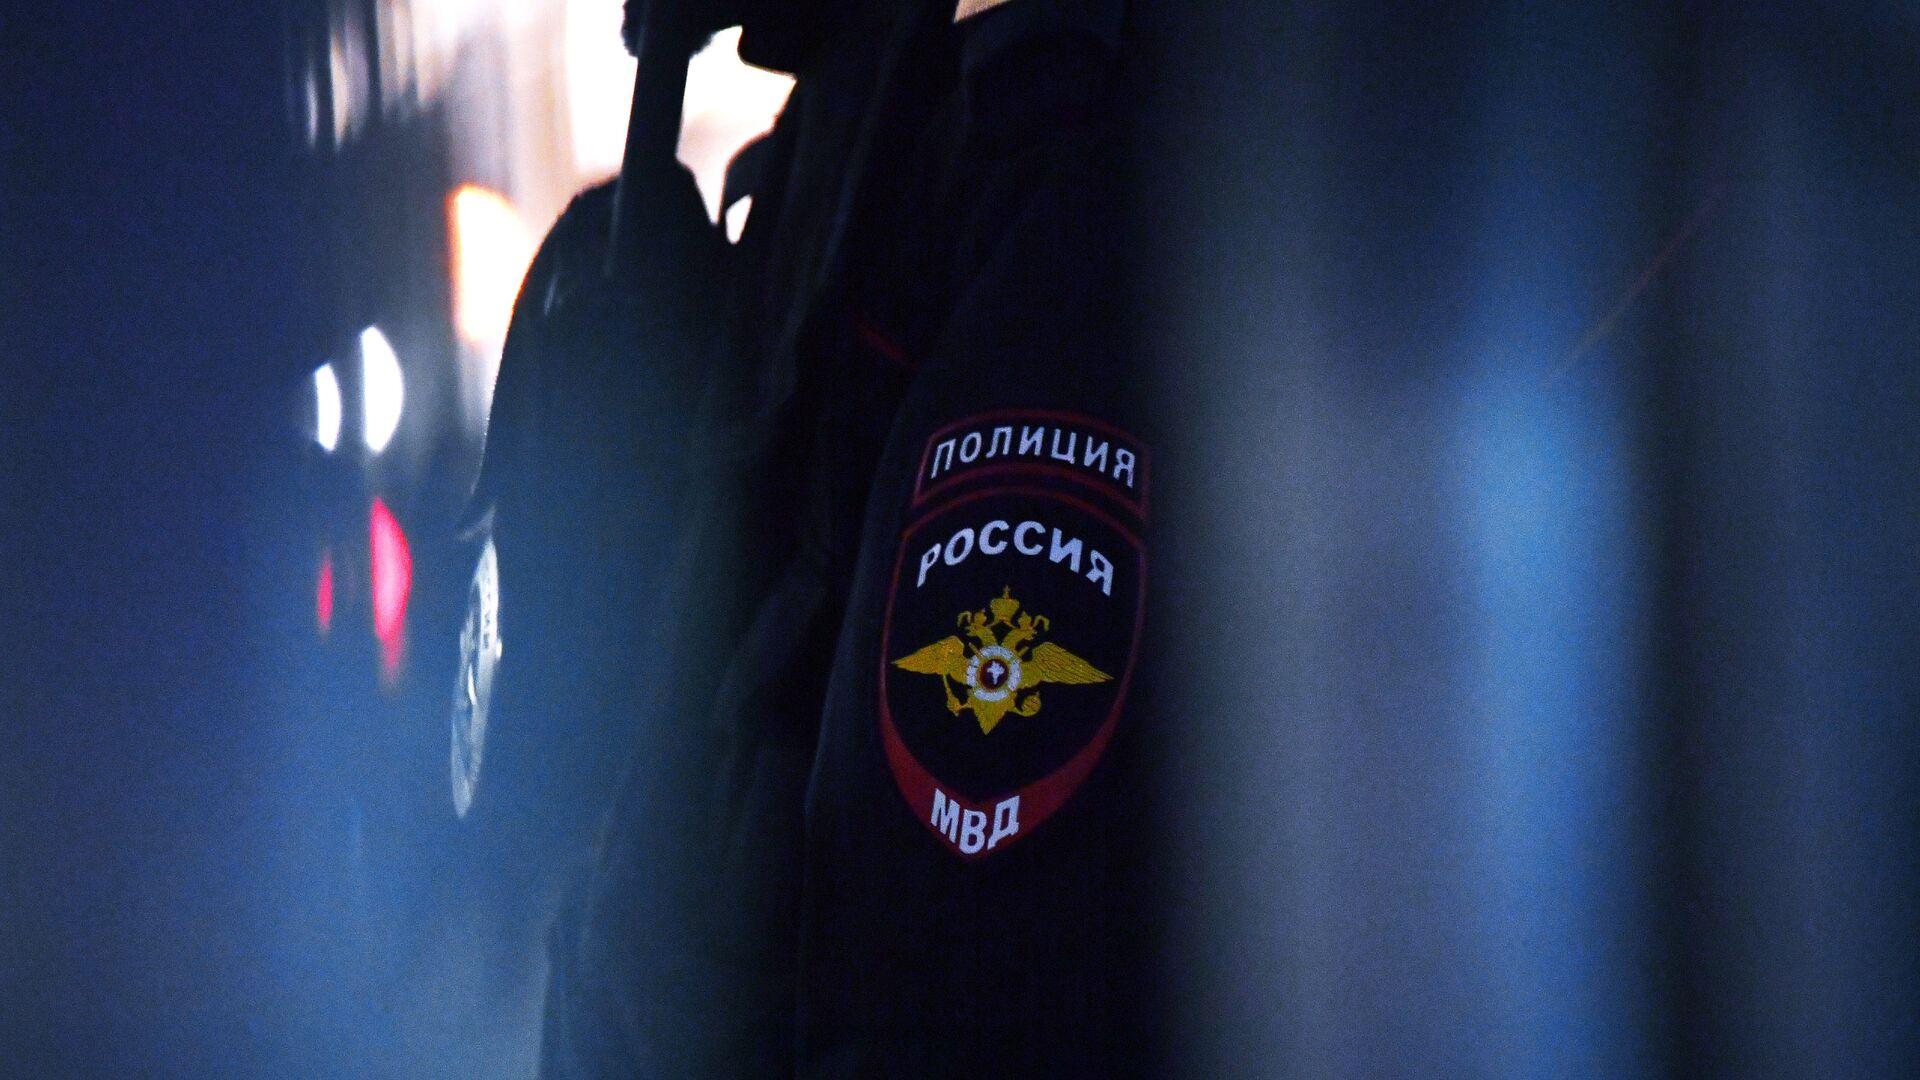 Нашивка на рукаве сотрудника полиции в России, архивное фото - Sputnik Узбекистан, 1920, 13.07.2021